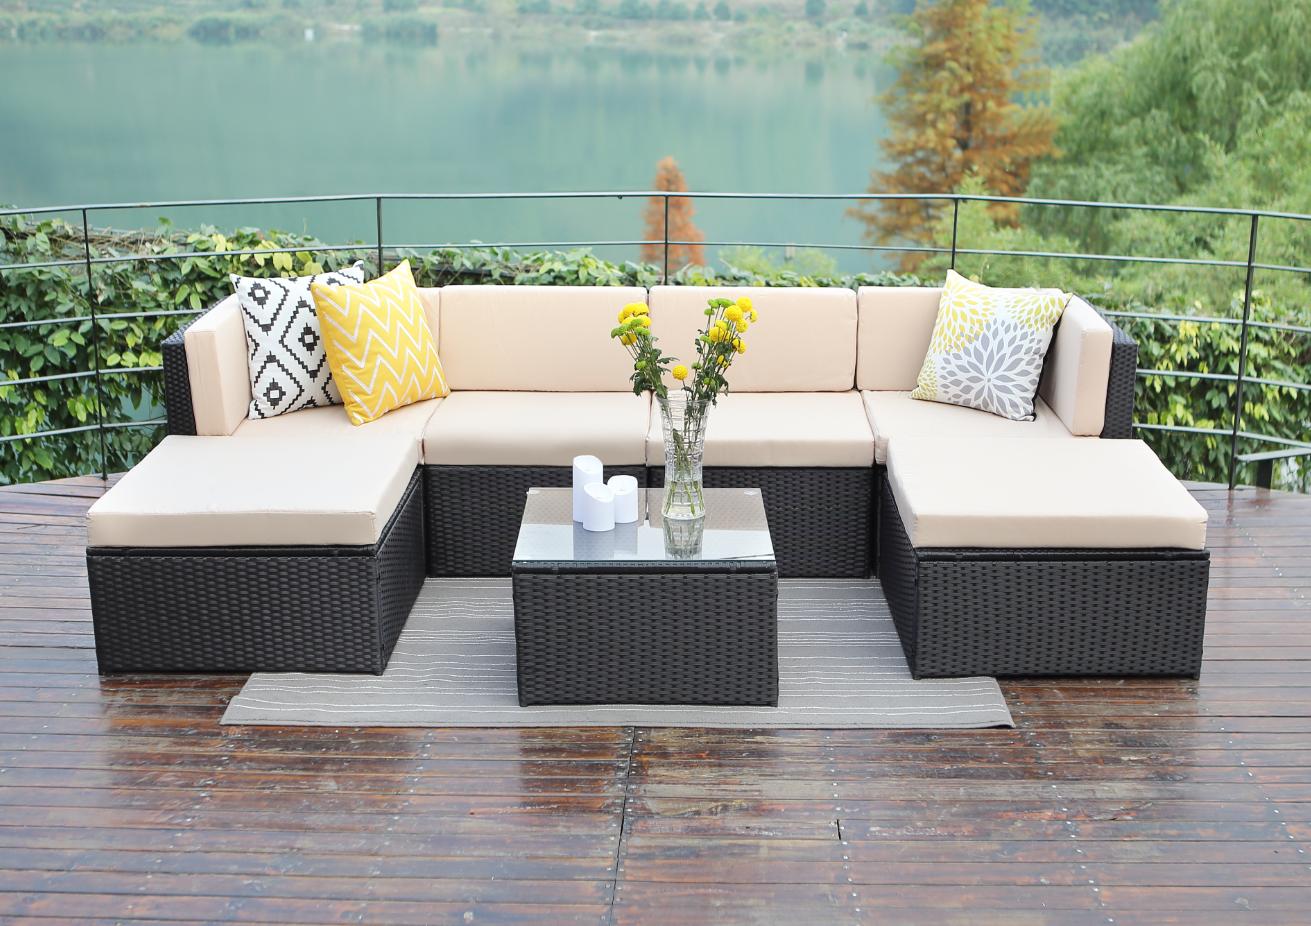 Rattan Wicker Outdoor Sofa Paradise Lounge Set 1 - Beige/Black image